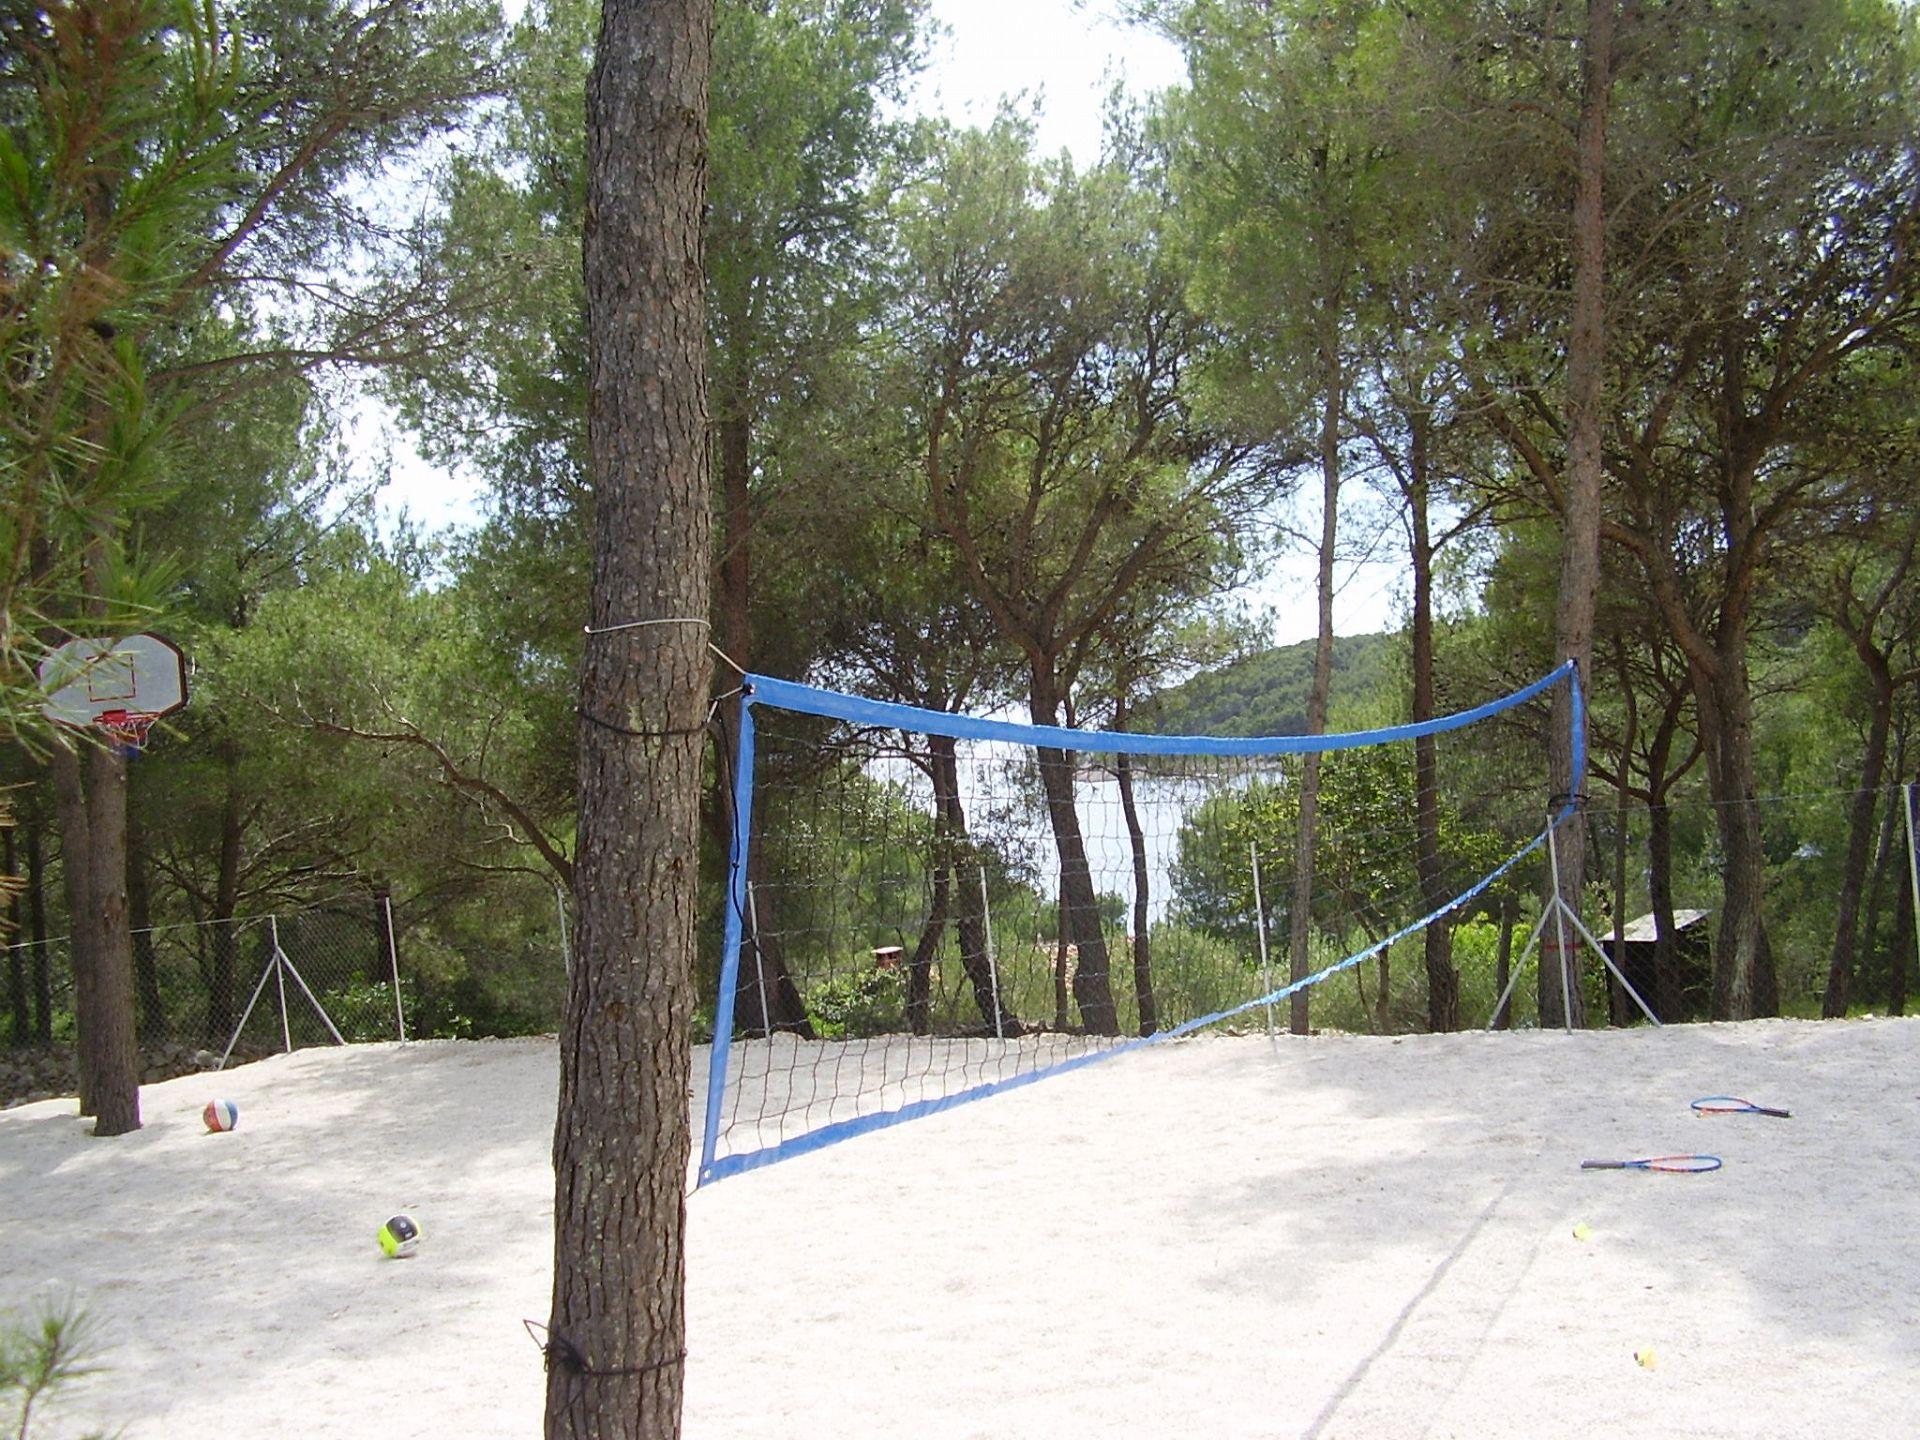 Denis - Baai Osibova (Milna) - Vakantiehuizen, villa´s Kroatië - speeltuin